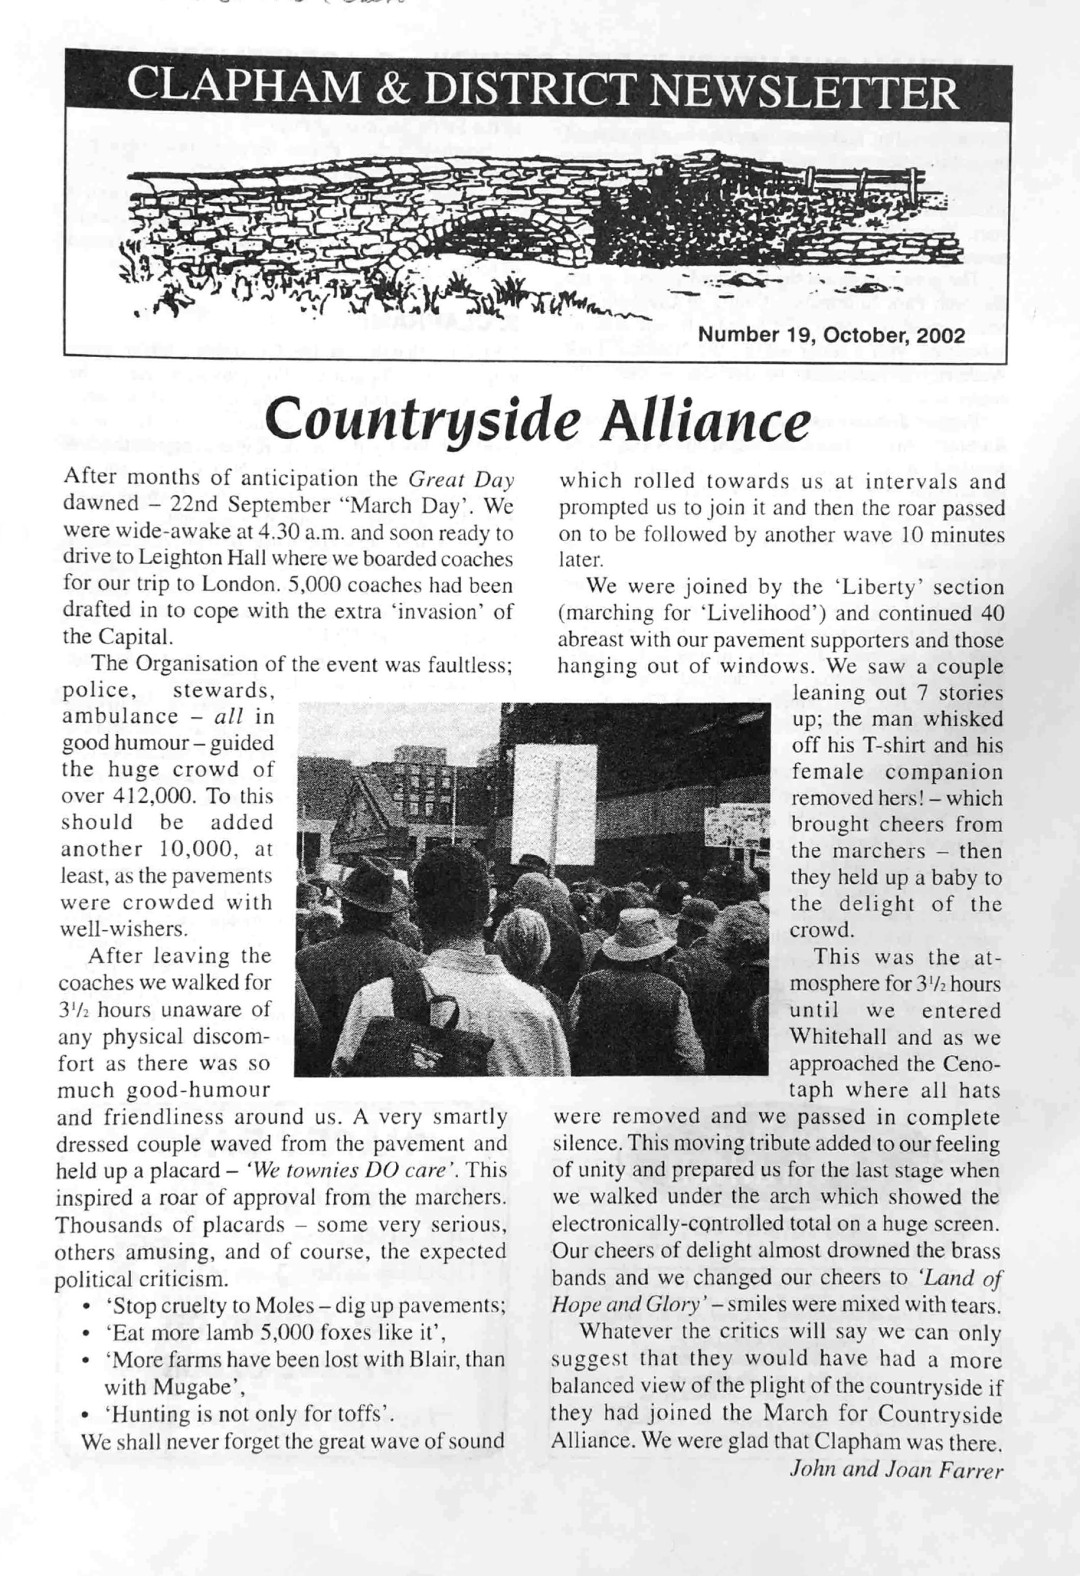 Clapham_Newsletter_No19_October_2002-1